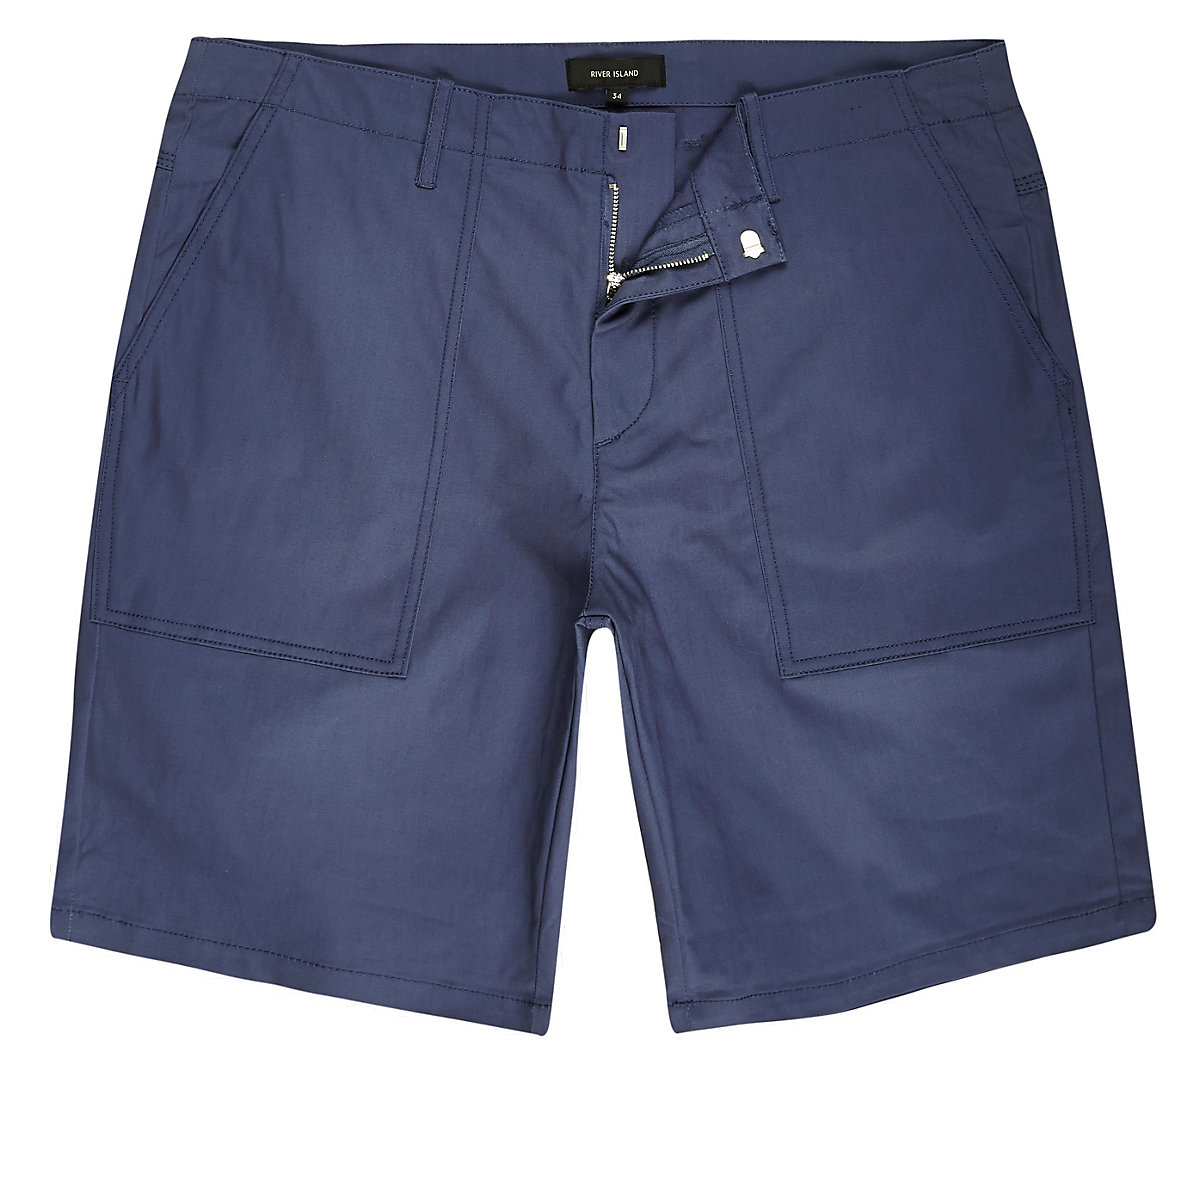 Short chino habillé bleu coupe slim